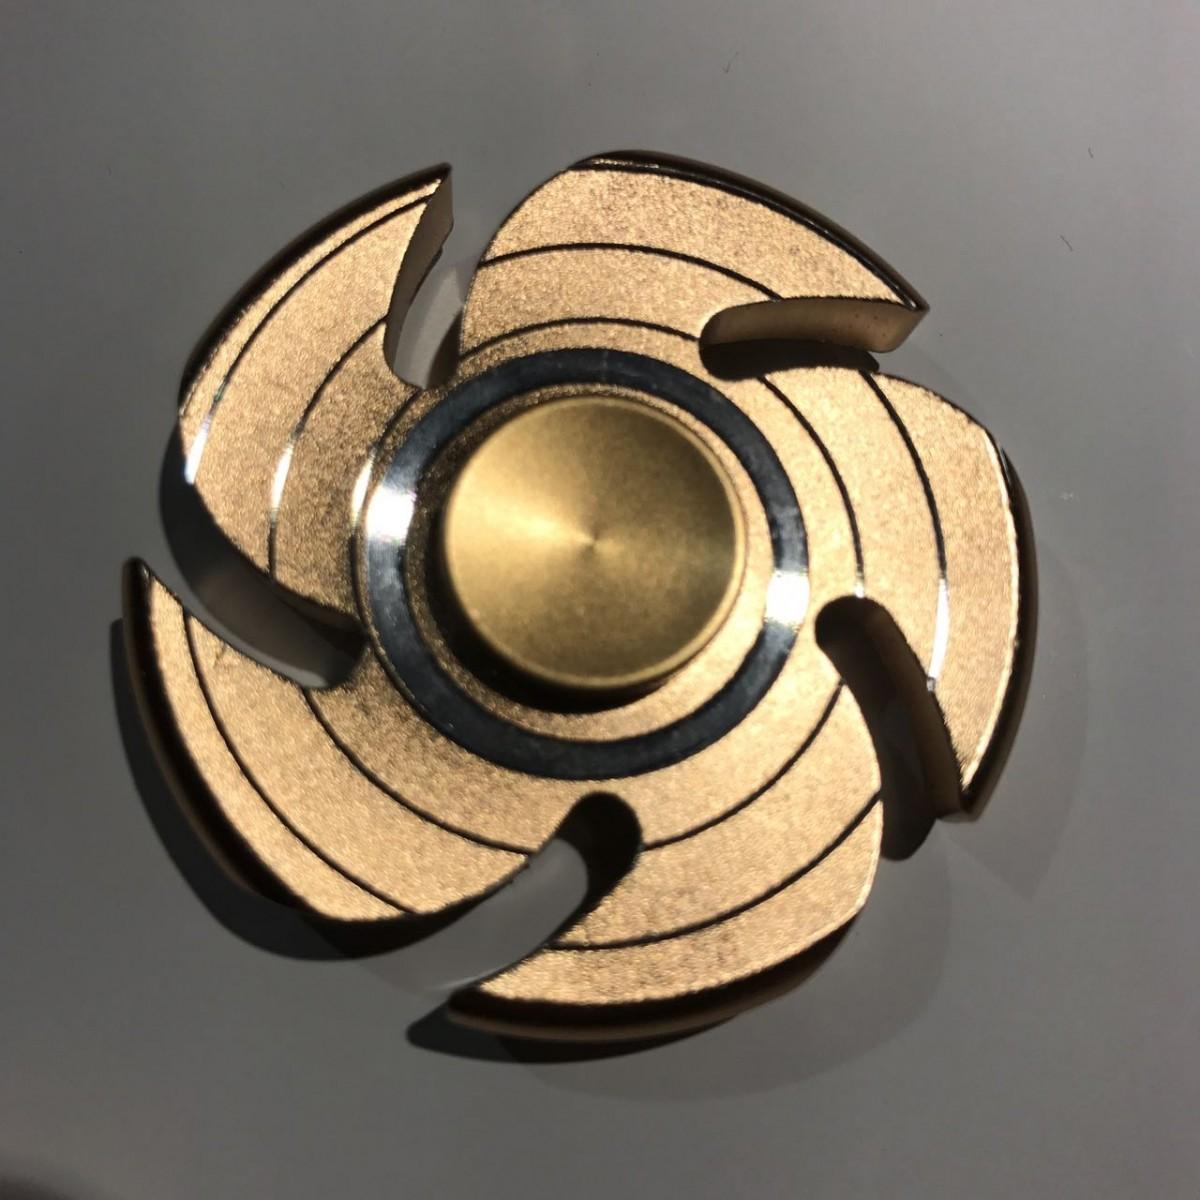 Hand Spinner Serra Circular - Rolamento Anti Estresse Fidget Hand Spinner